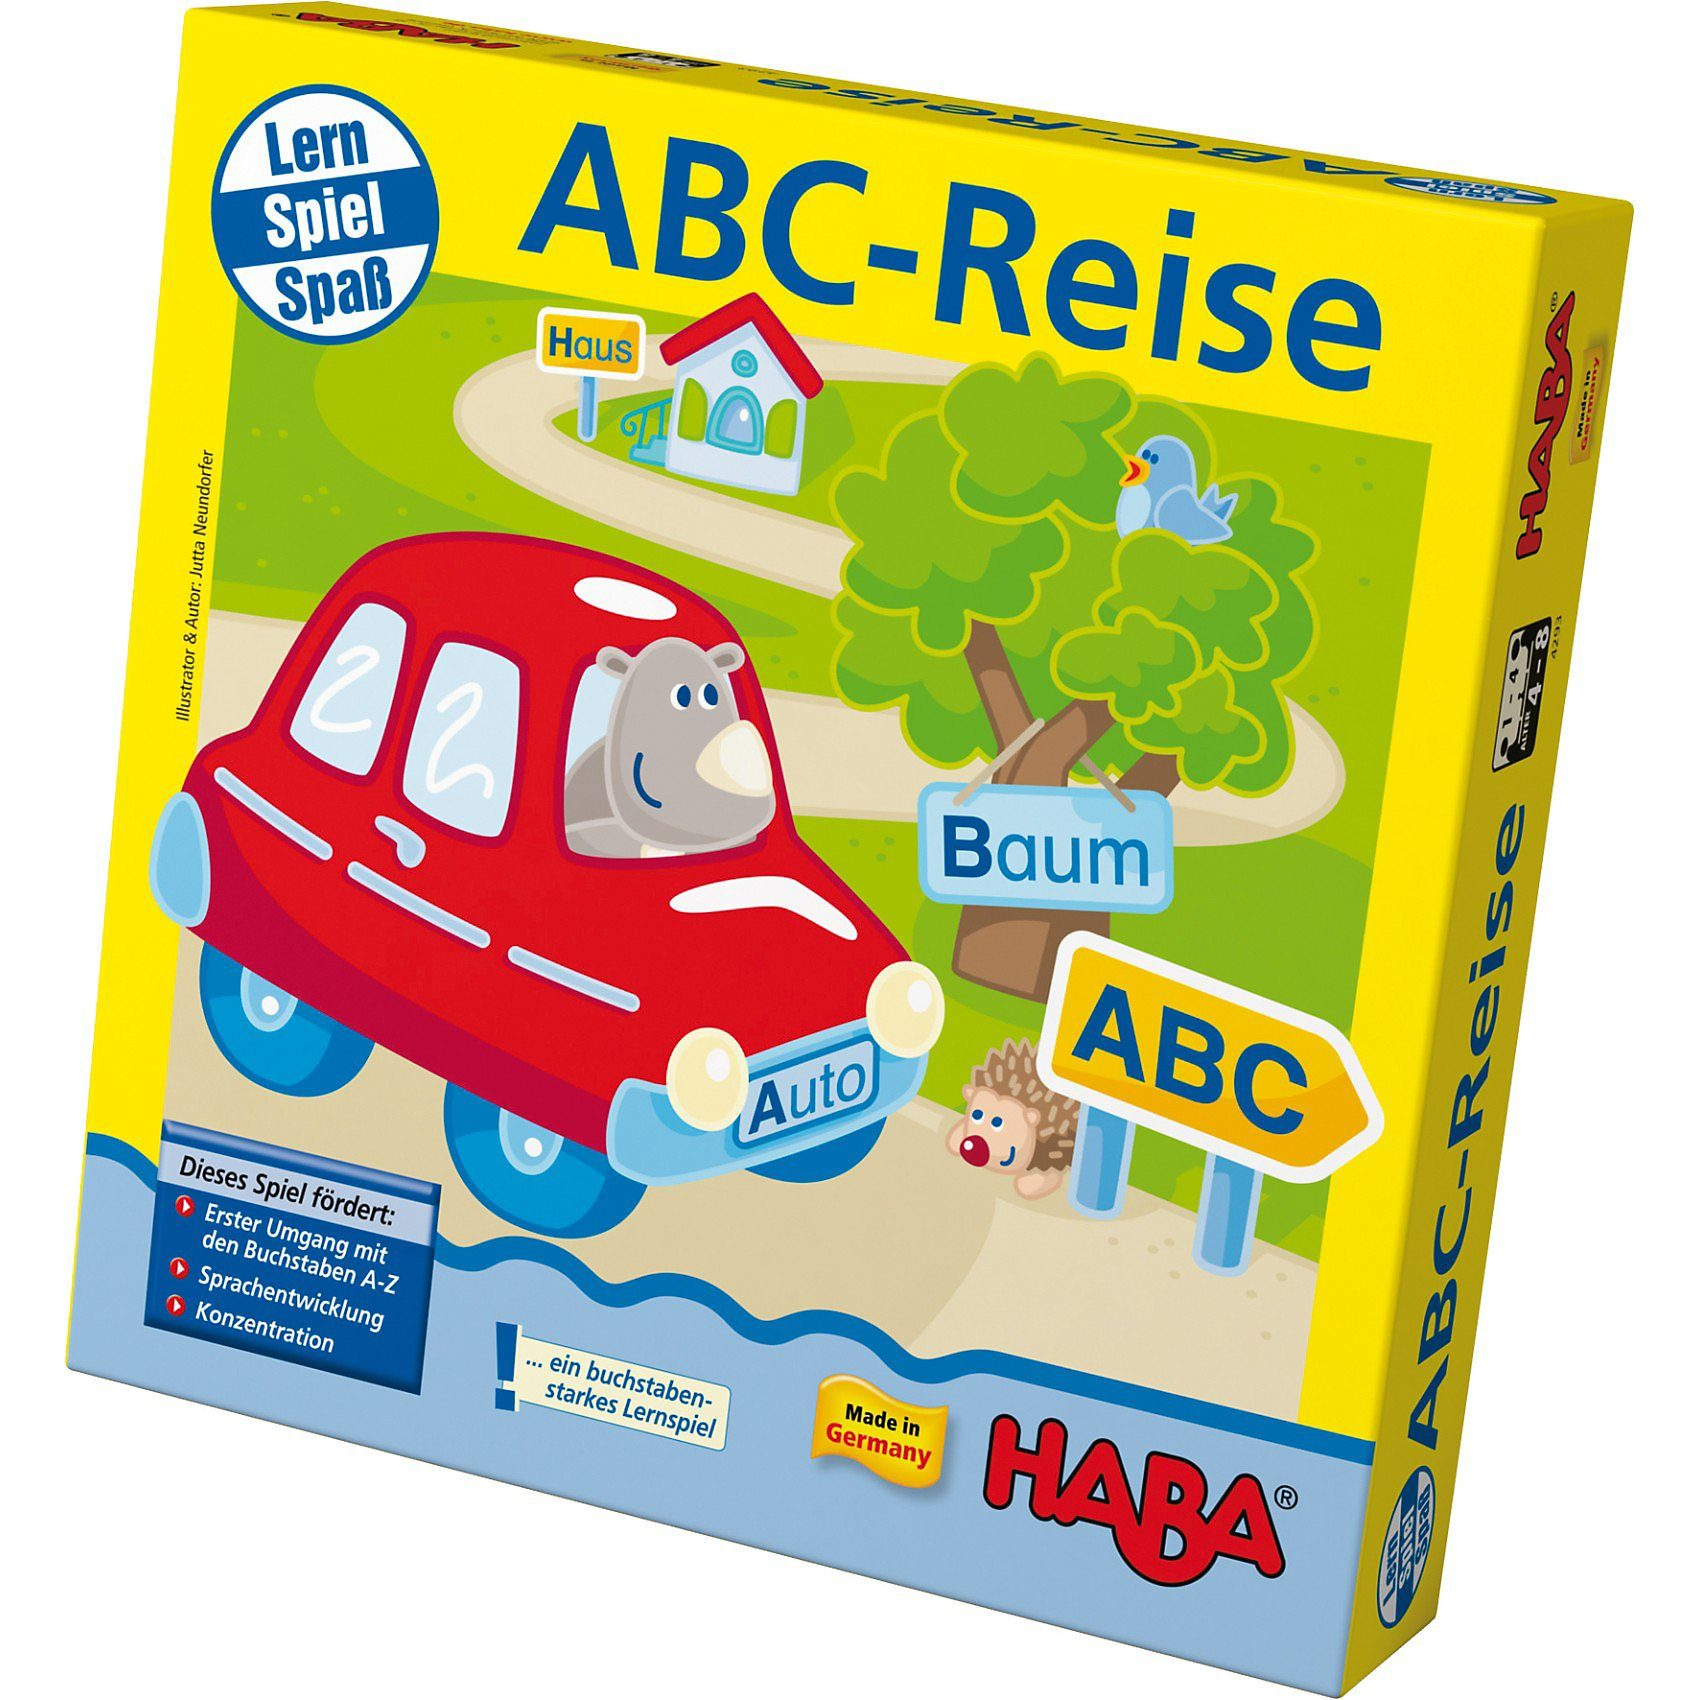 Haba ABC-Reise